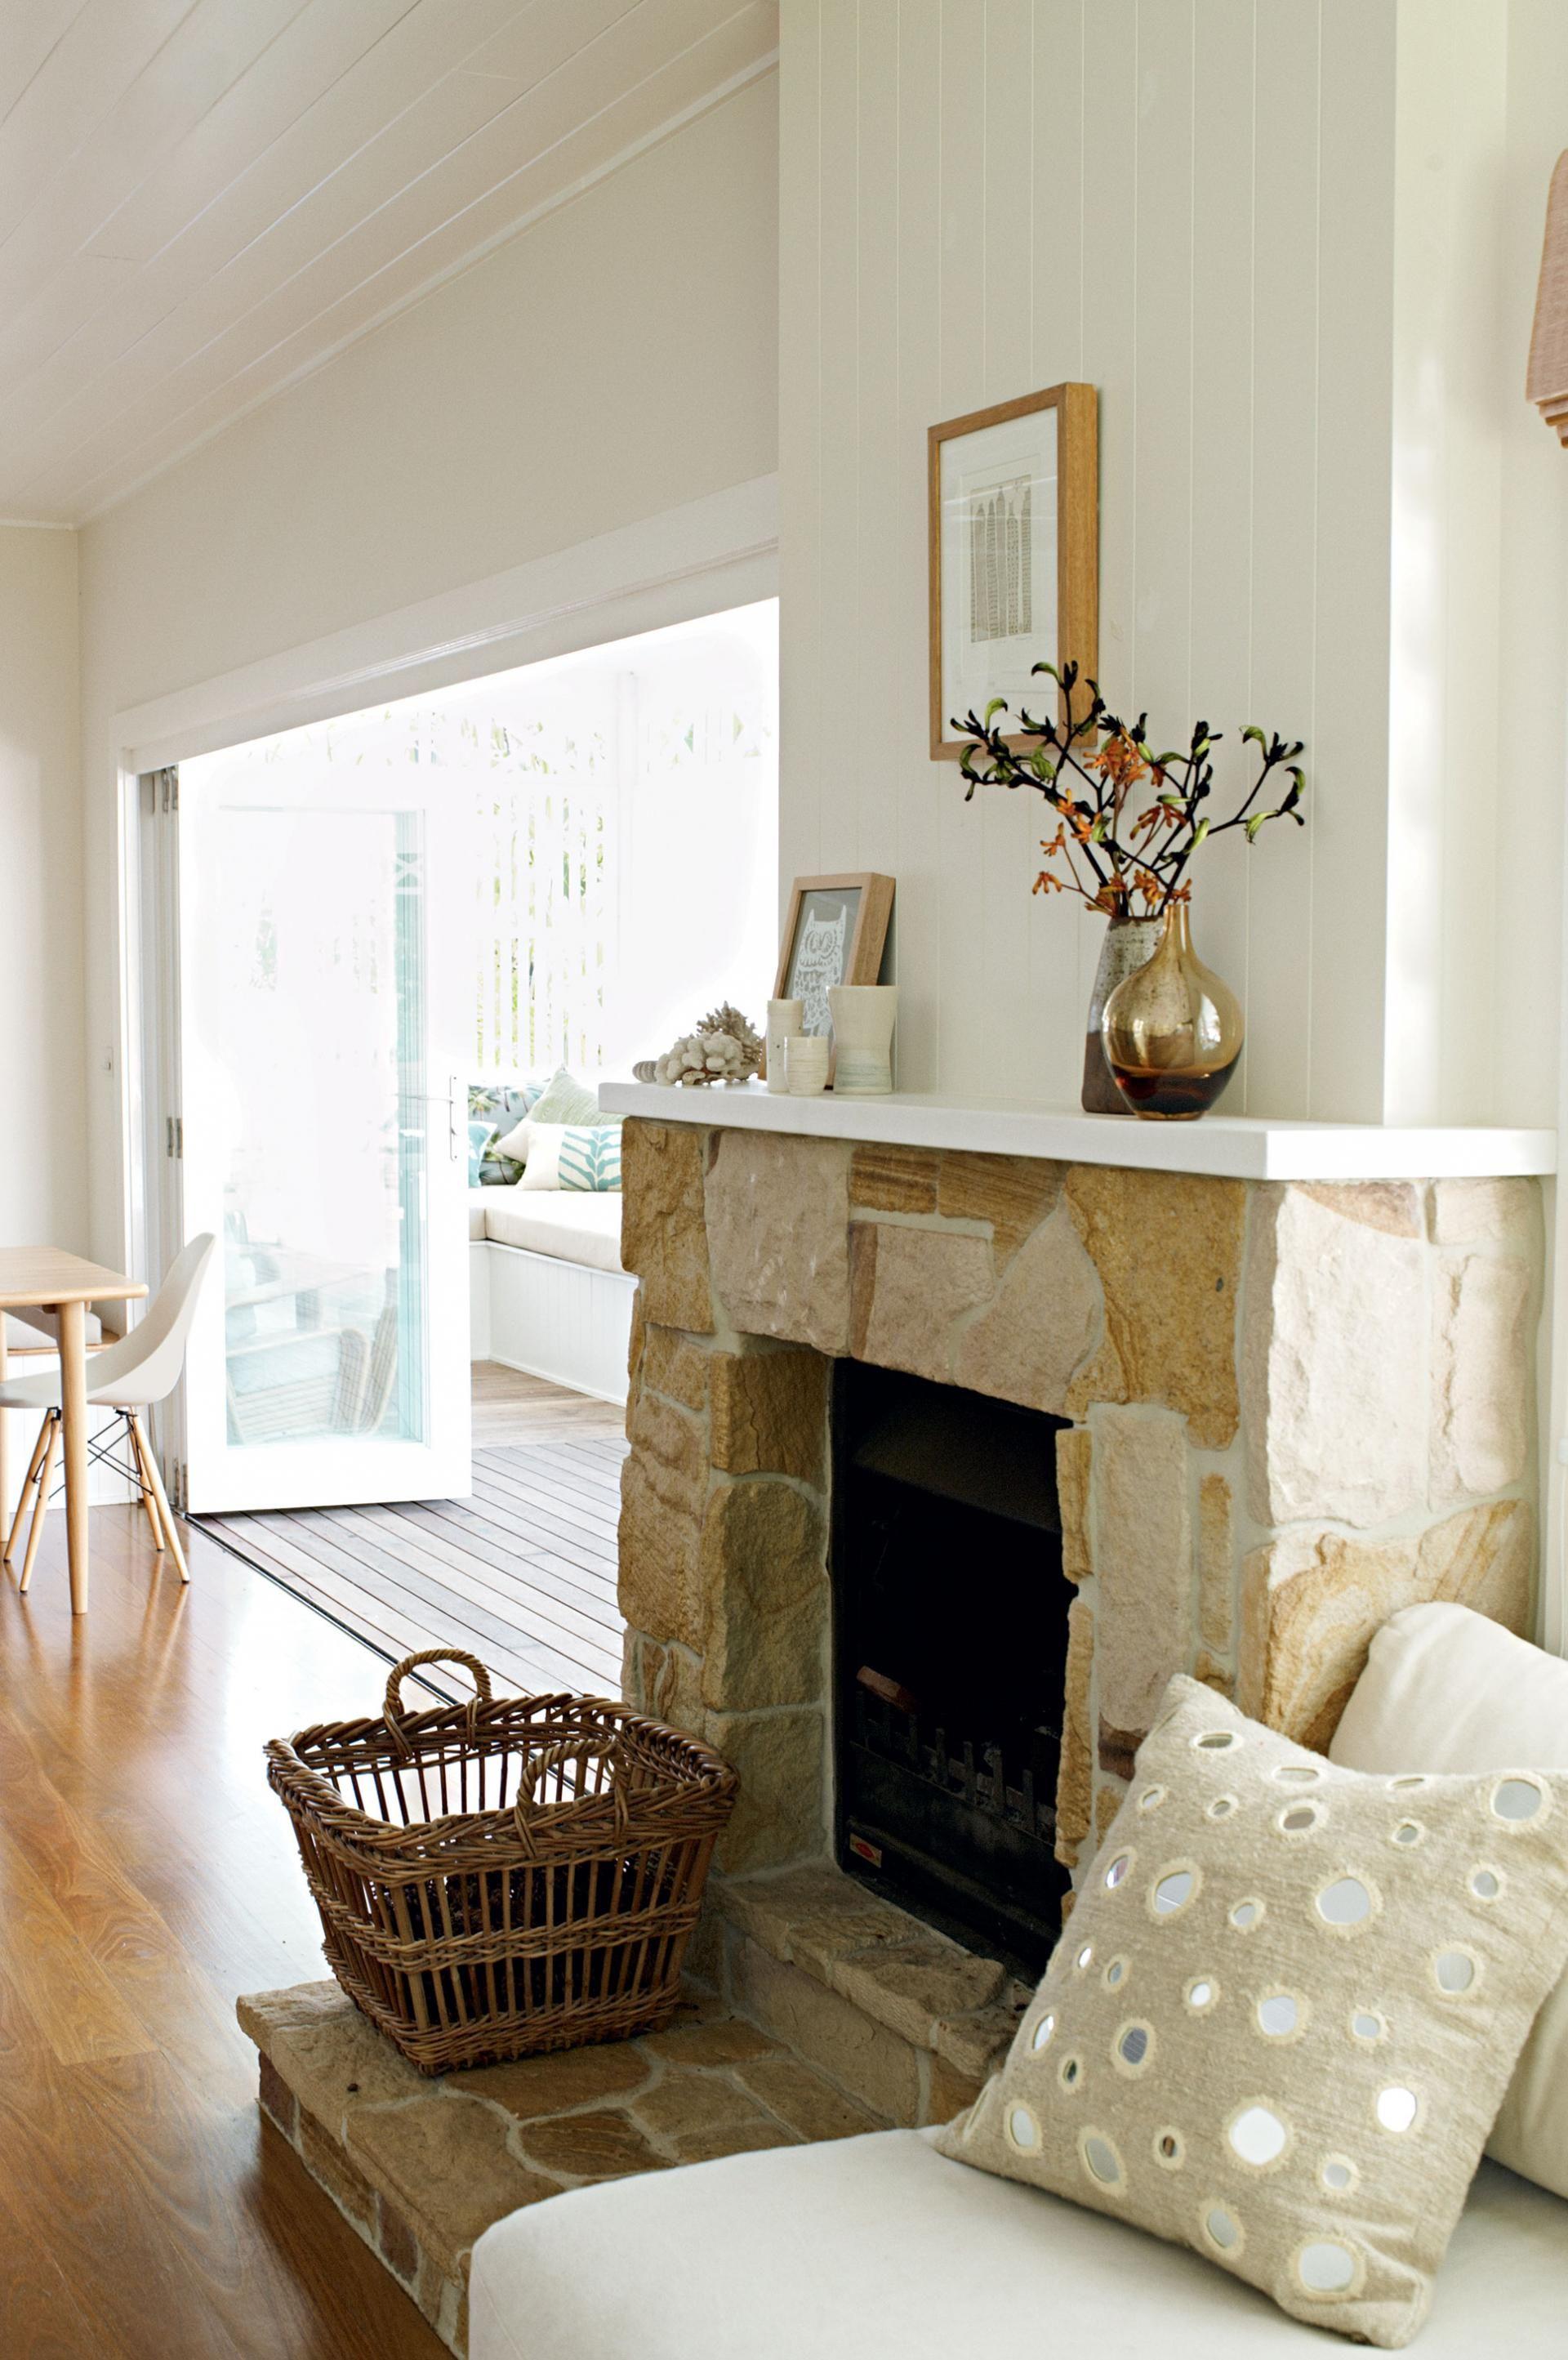 byron-bay-home-Ruscoe-11-fireplace | kitchen lounge | Pinterest ...